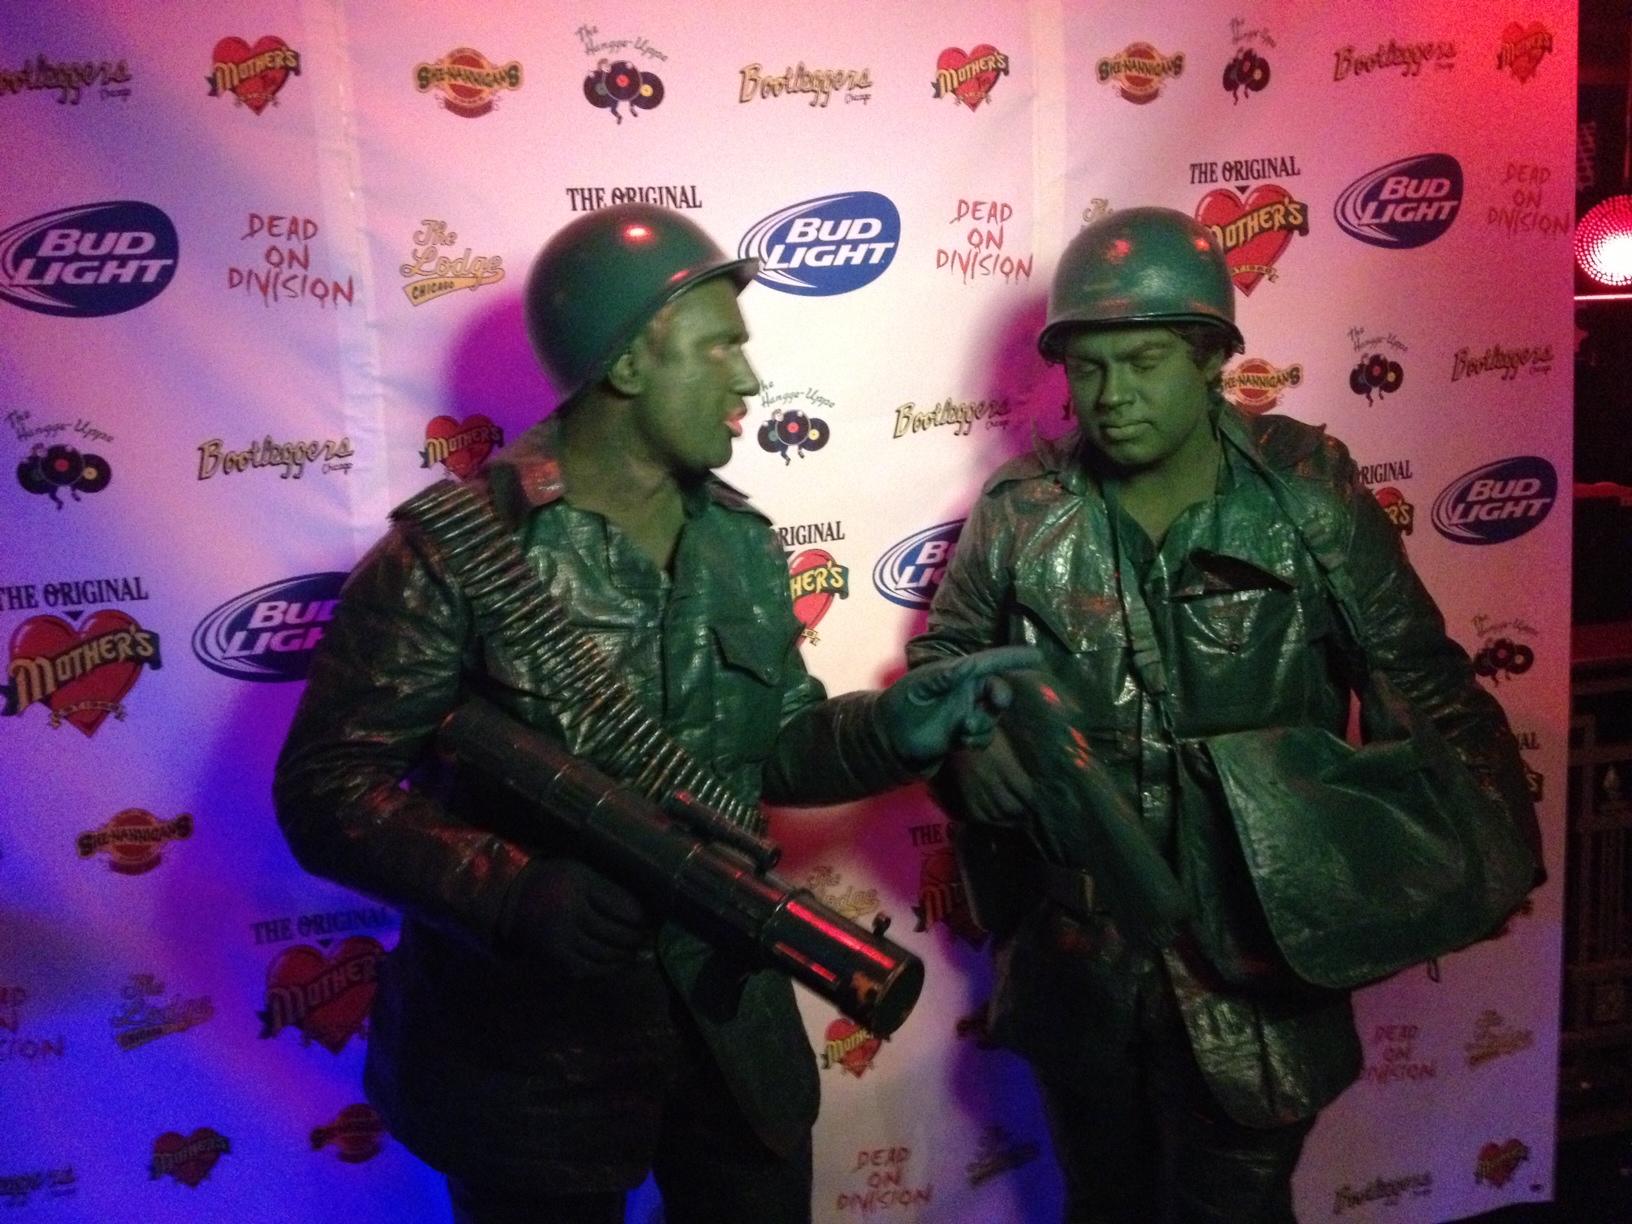 Green army guys Halloween costumes.